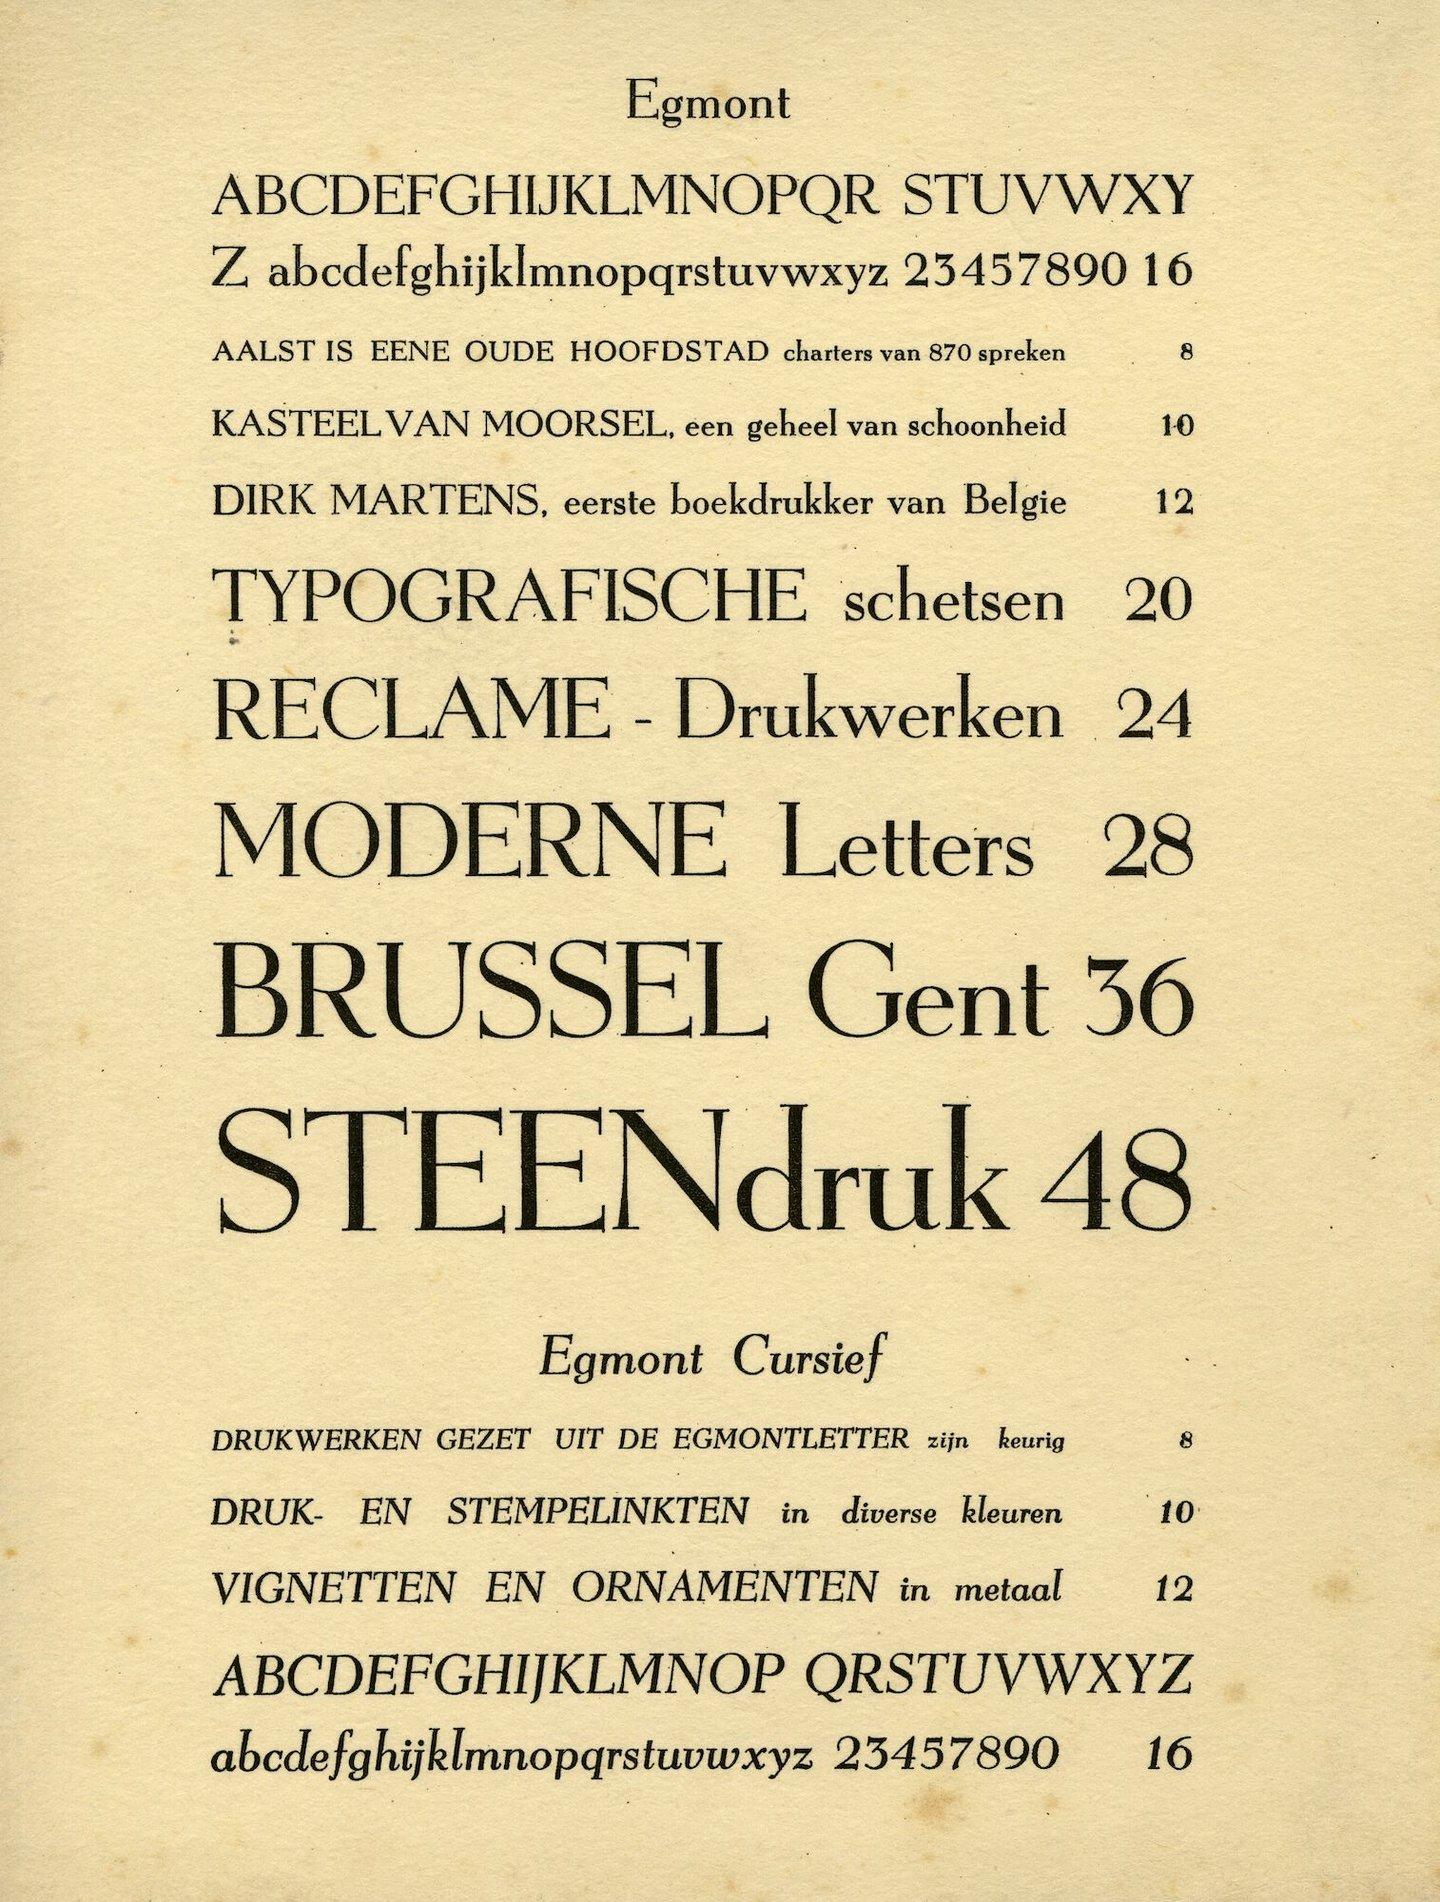 Letterproef van het lettertype Egmont